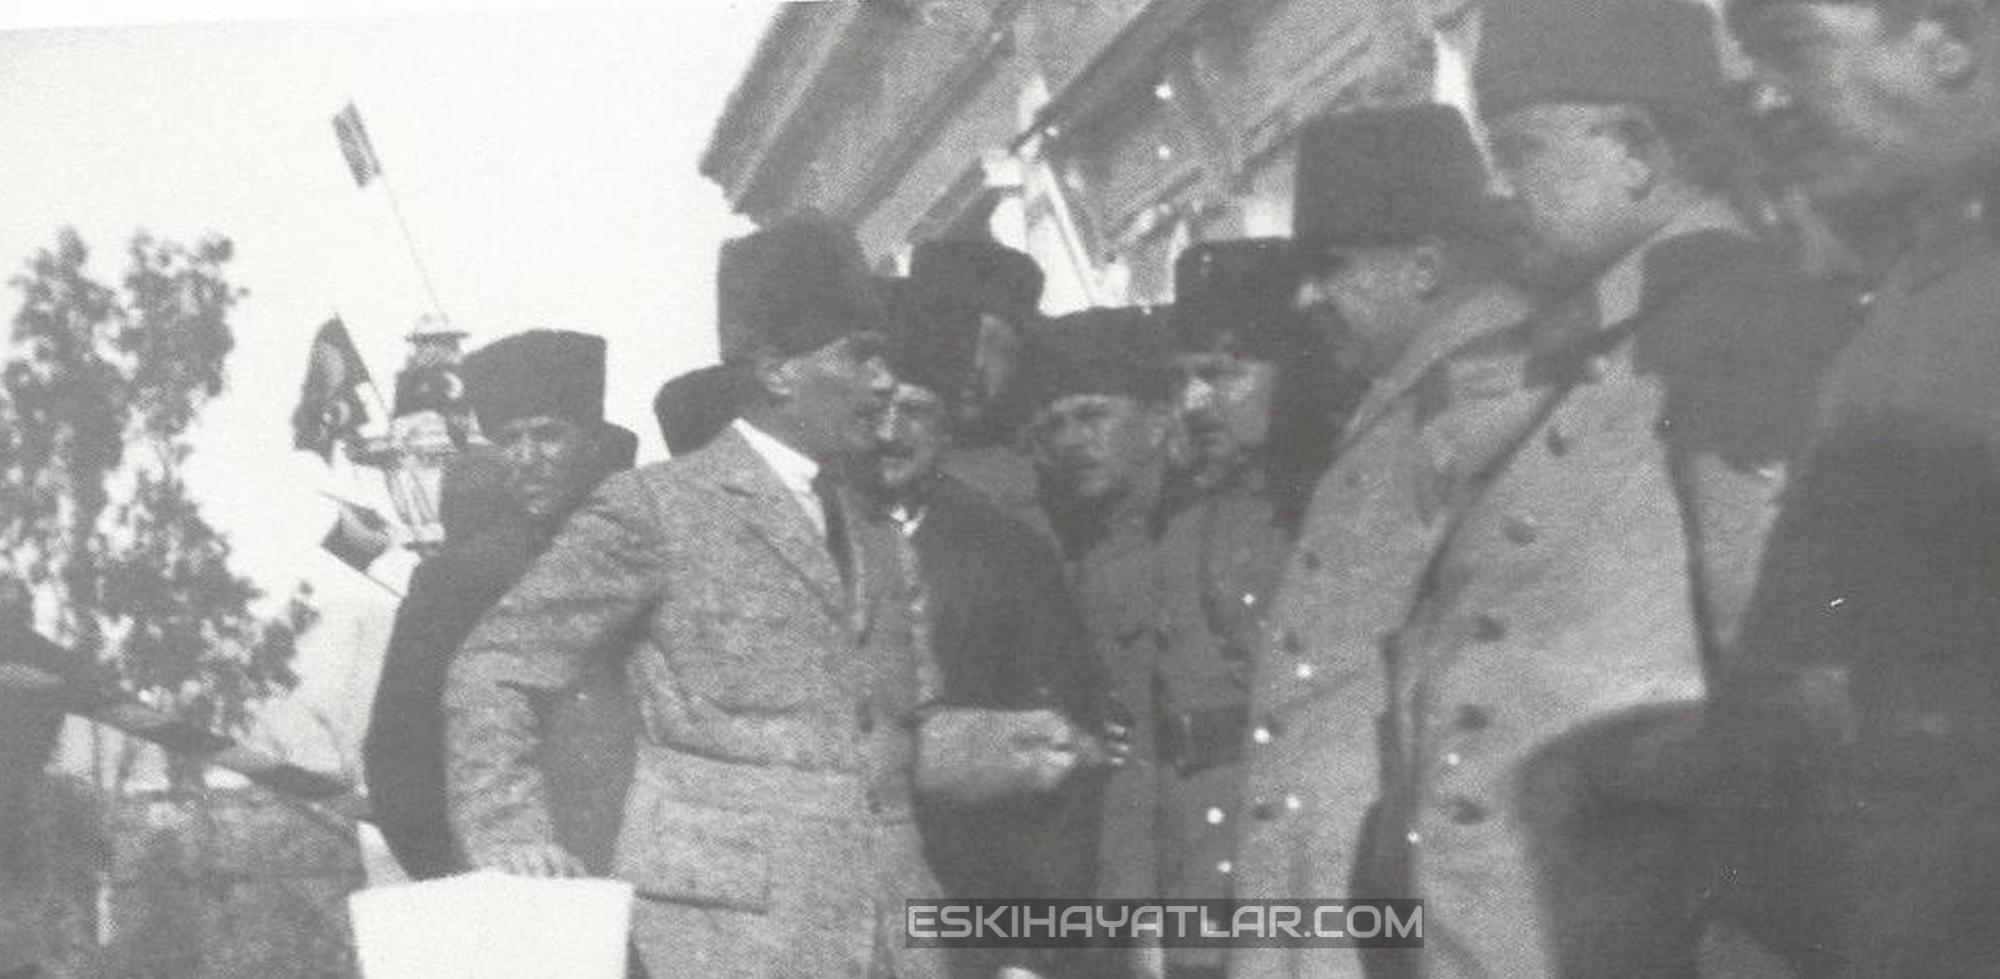 ataturk-izmir-gunleri-mustafa-kemal-pasa-1922-izmir-fotograflari (6)